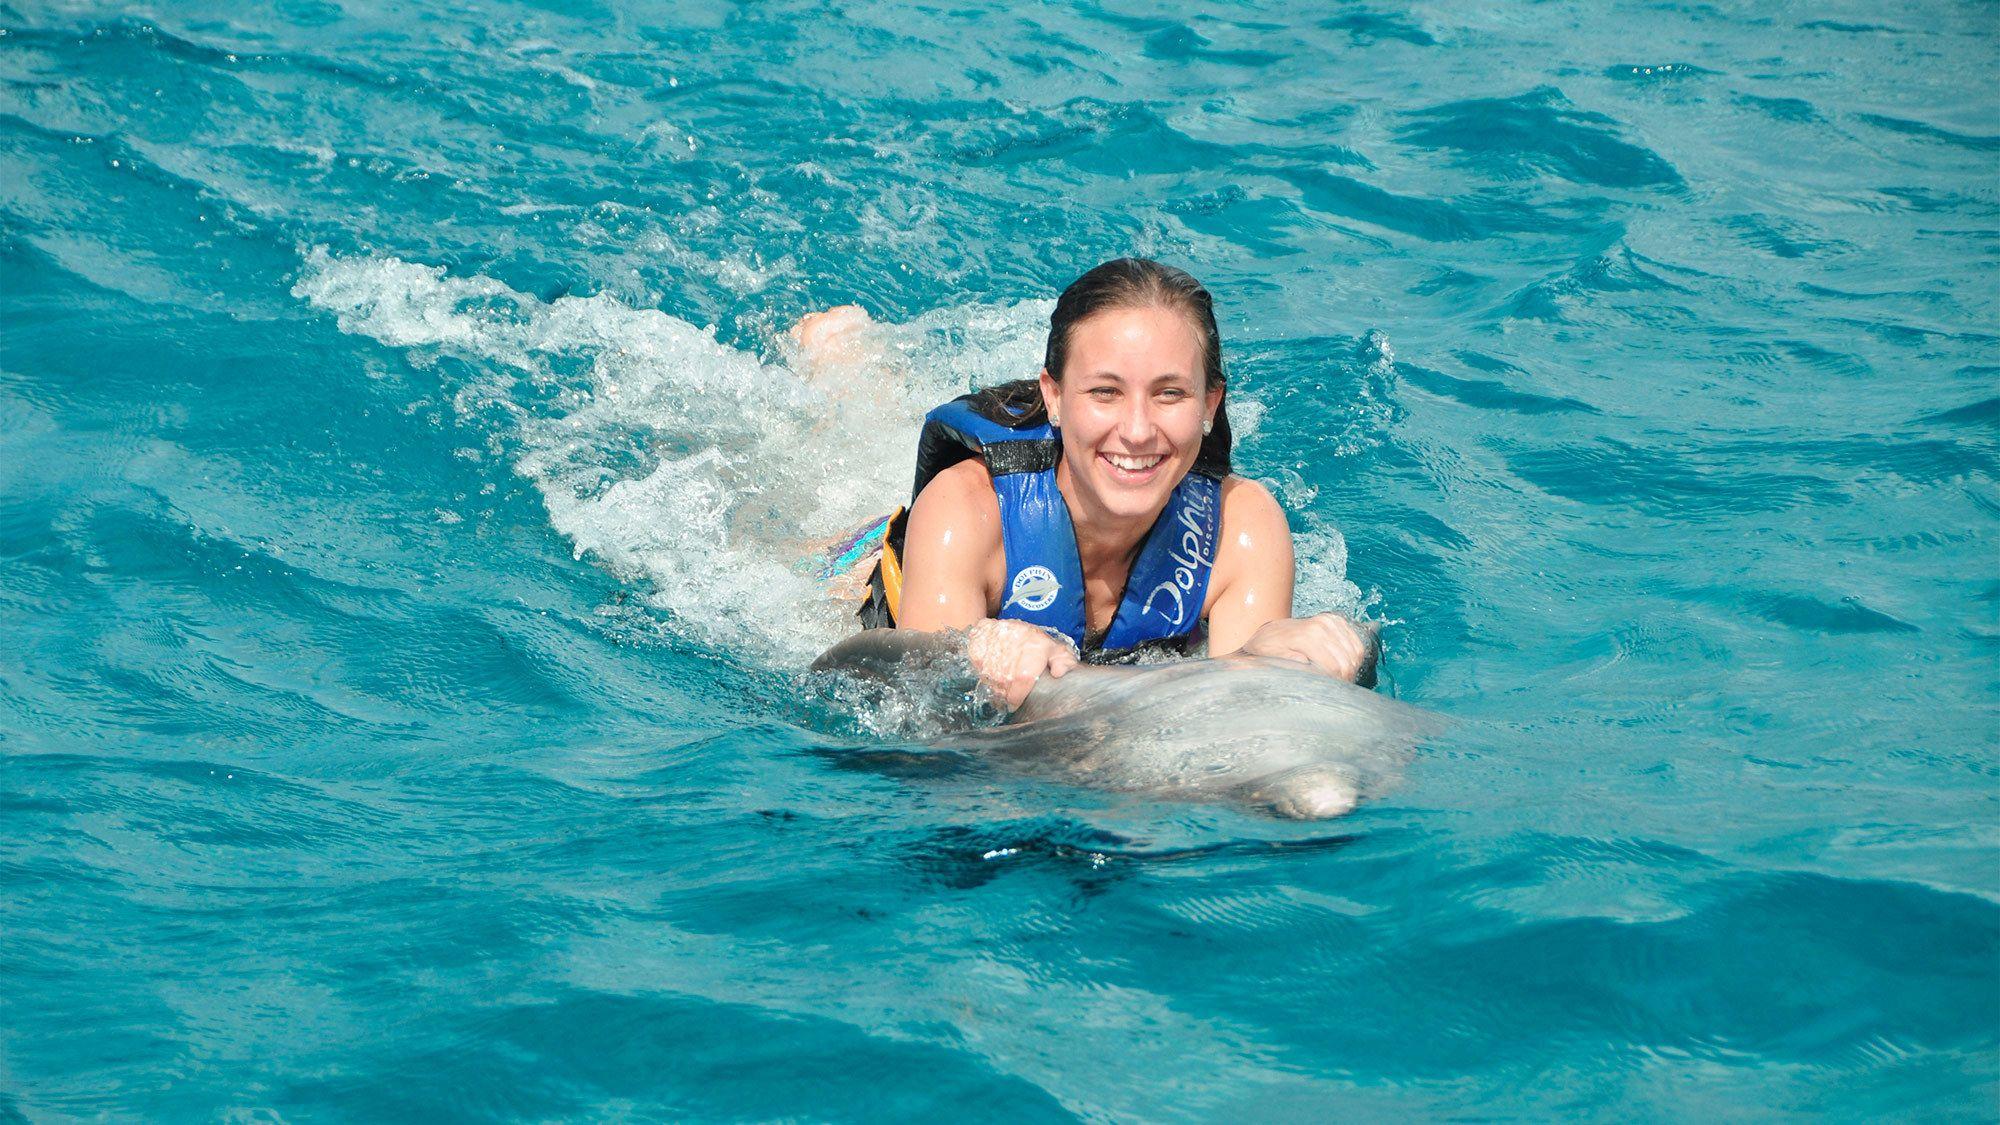 Woman enjoying the Dolphin Swim Adventure in Punta Cana